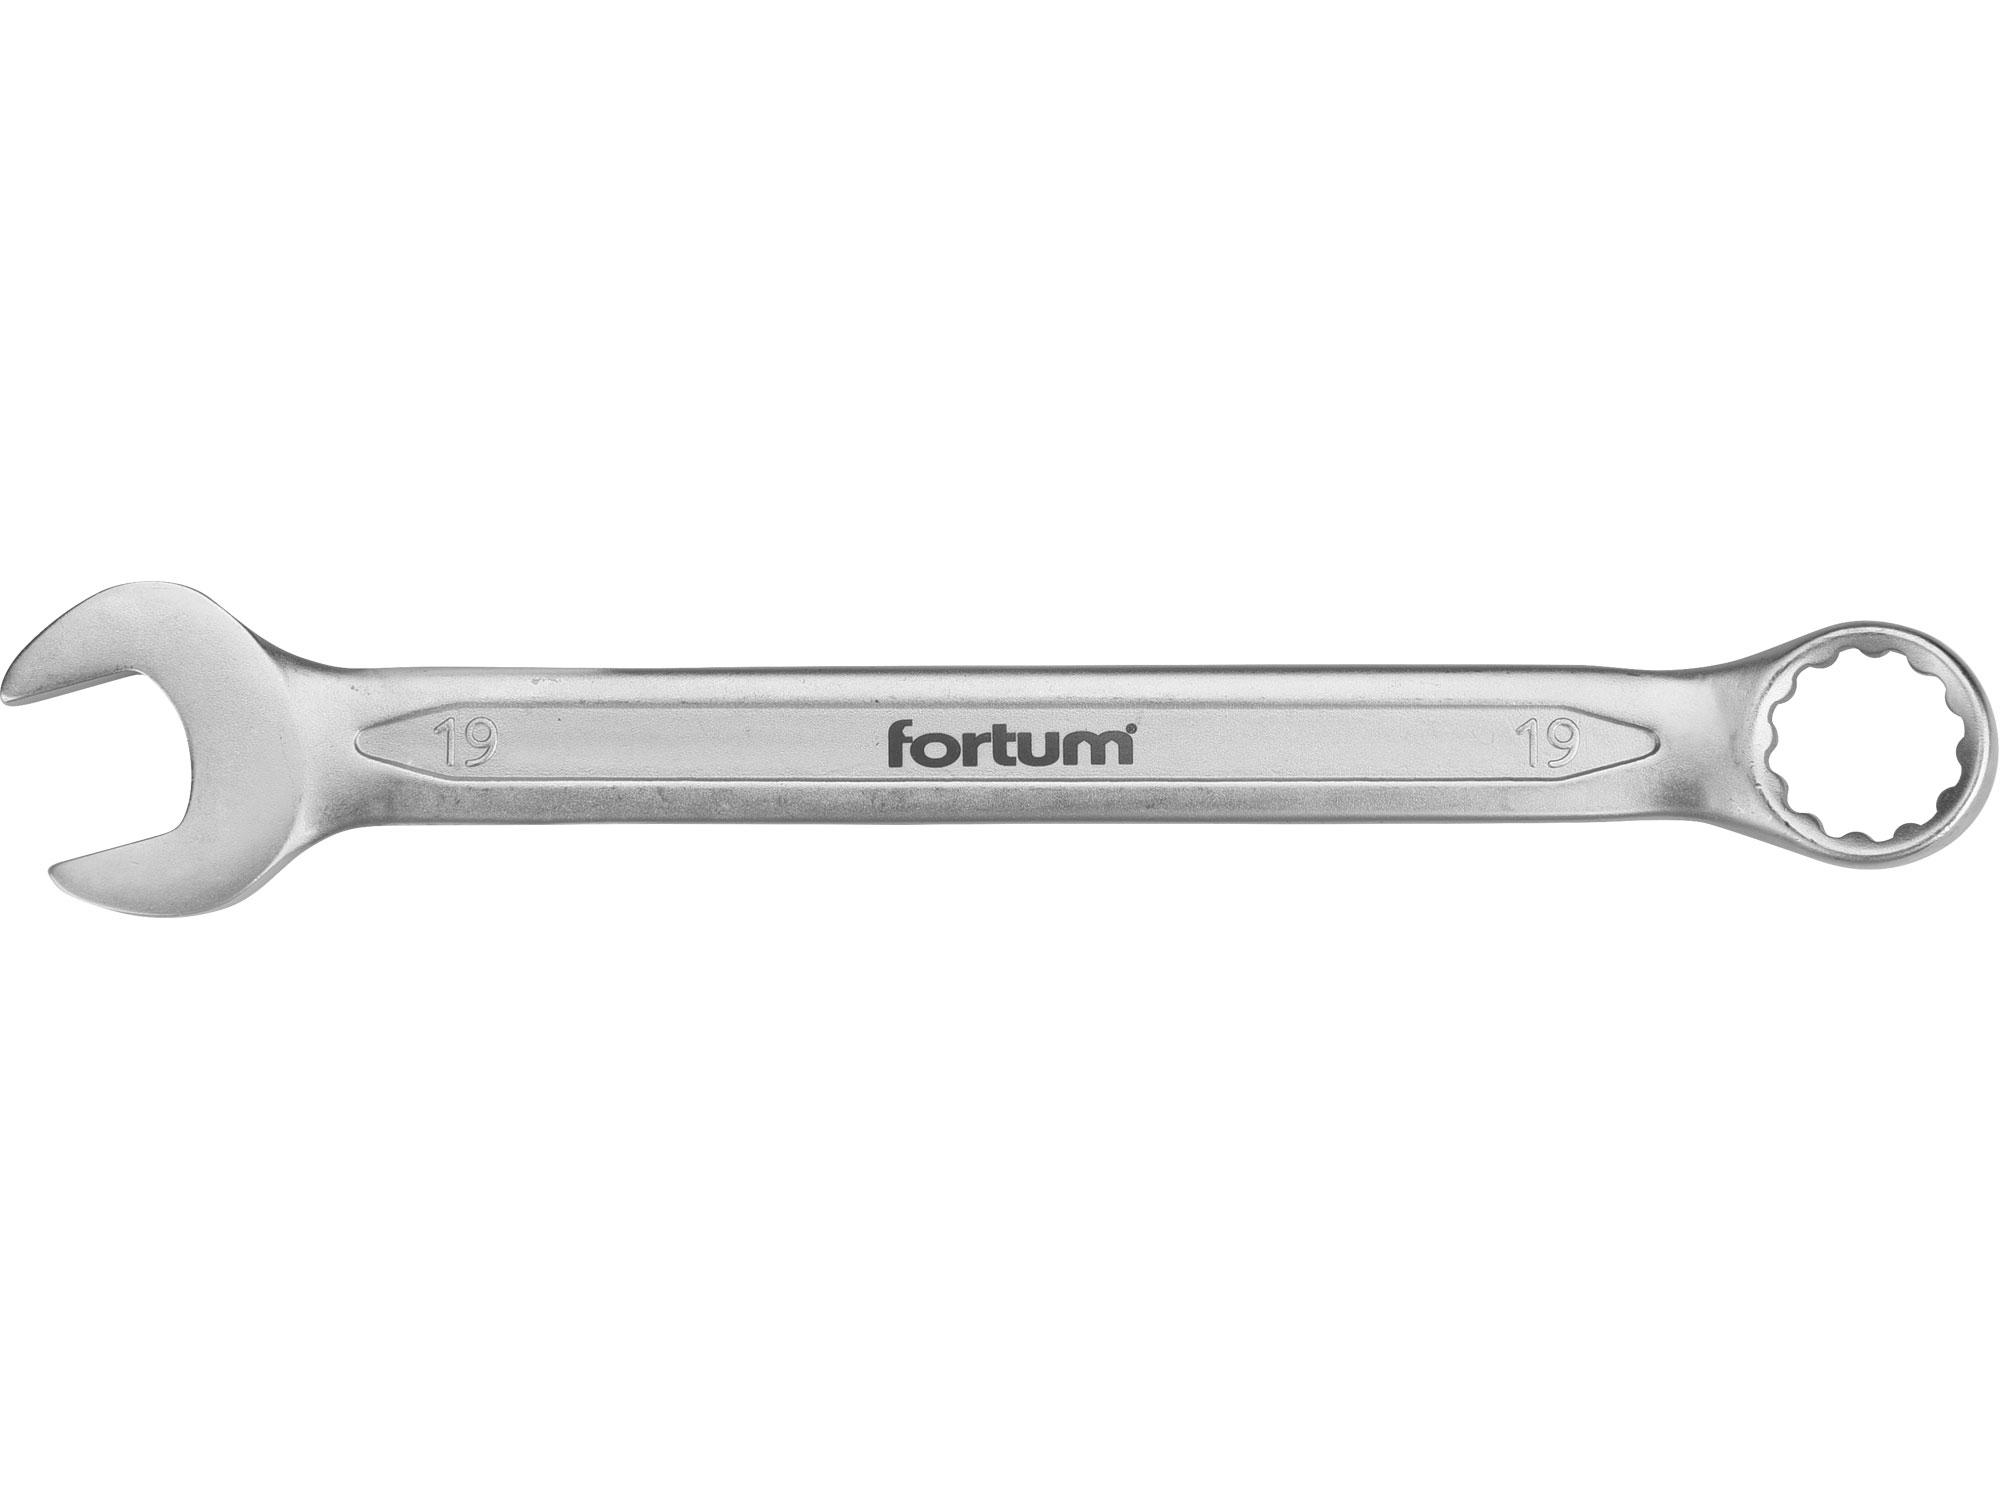 klíč očkoplochý, 19mm, L 241mm, FORTUM 4730219